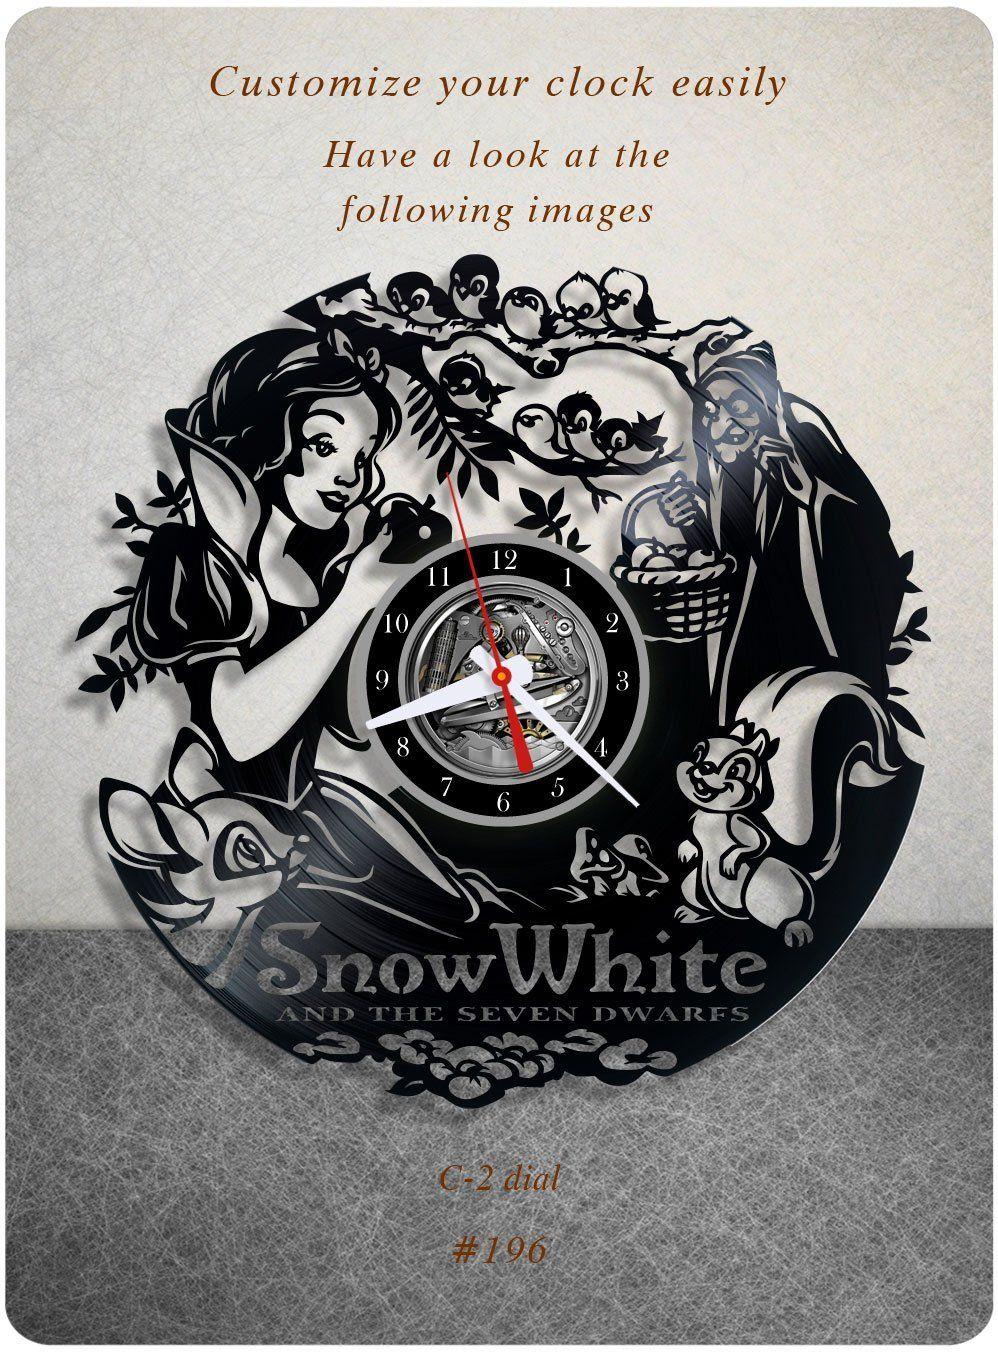 Snow white and the seven dwarfs vinyl clock vinyl wall clock snow white and the seven dwarfs vinyl clock vinyl wall clock vinyl record clock walt disney wall art home decor kids birthday gift 196 amipublicfo Choice Image